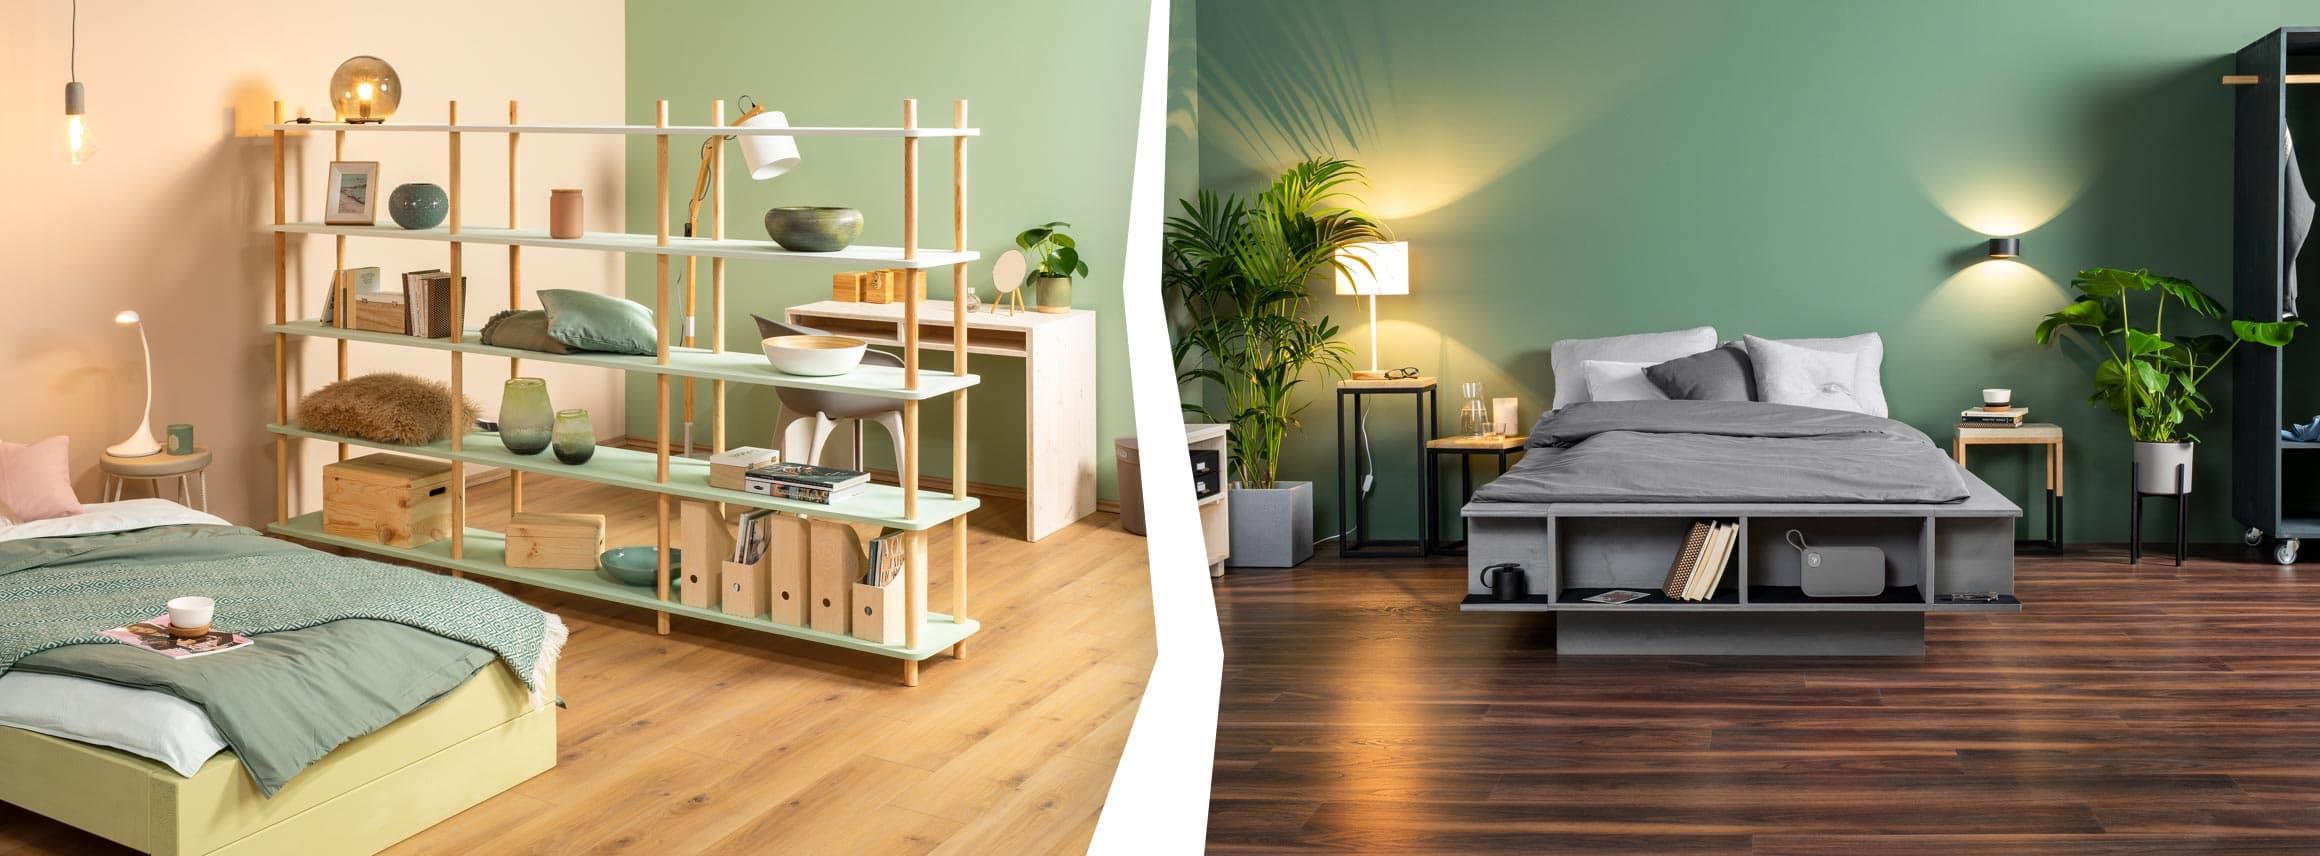 dfdddac923717c Individuelle Möbel selber bauen - OBI Selbstbaumöbel